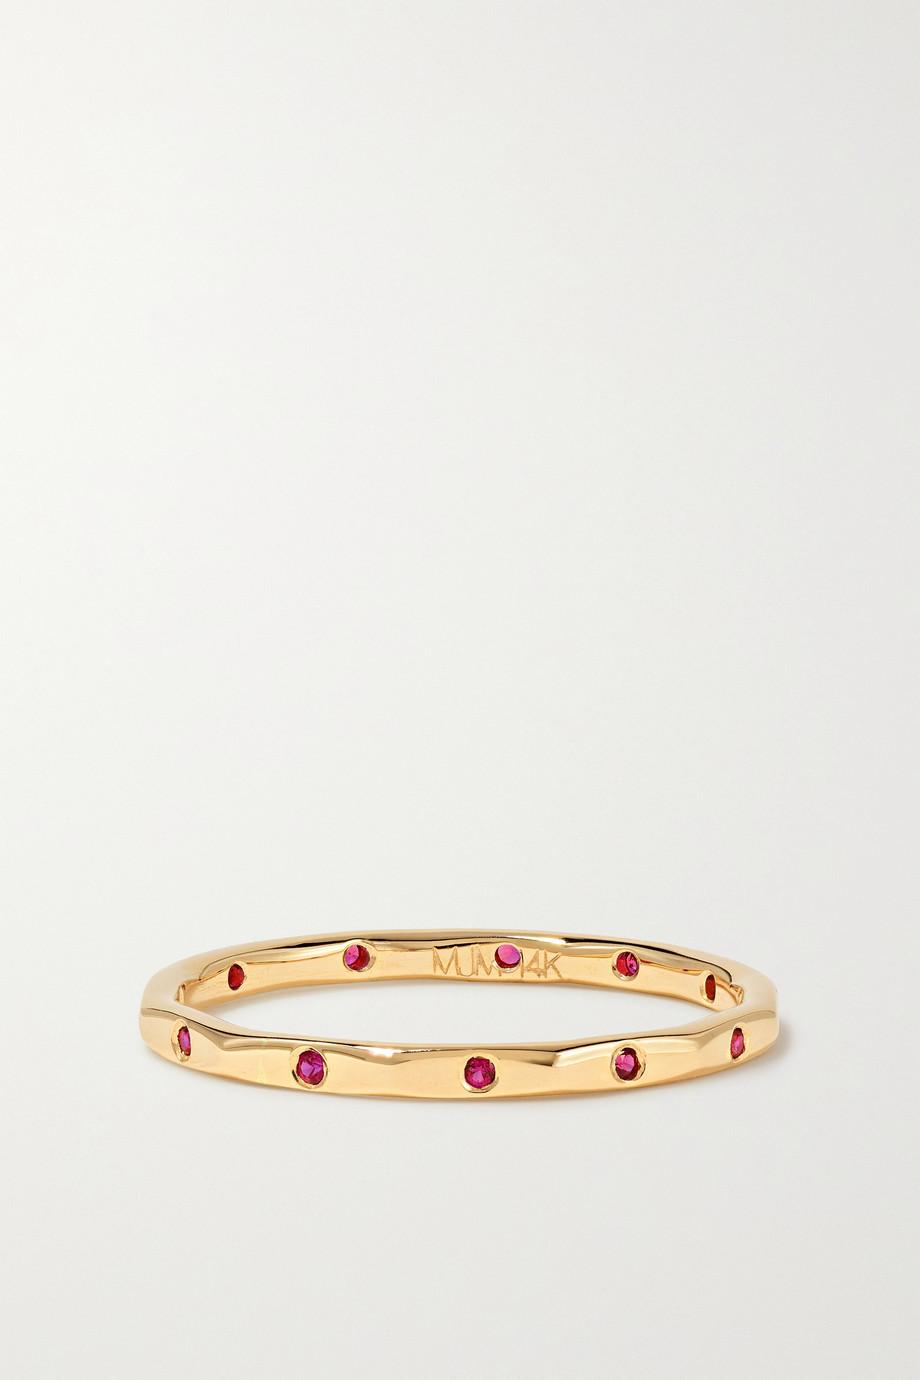 Melissa Joy Manning 14-karat gold ruby ring